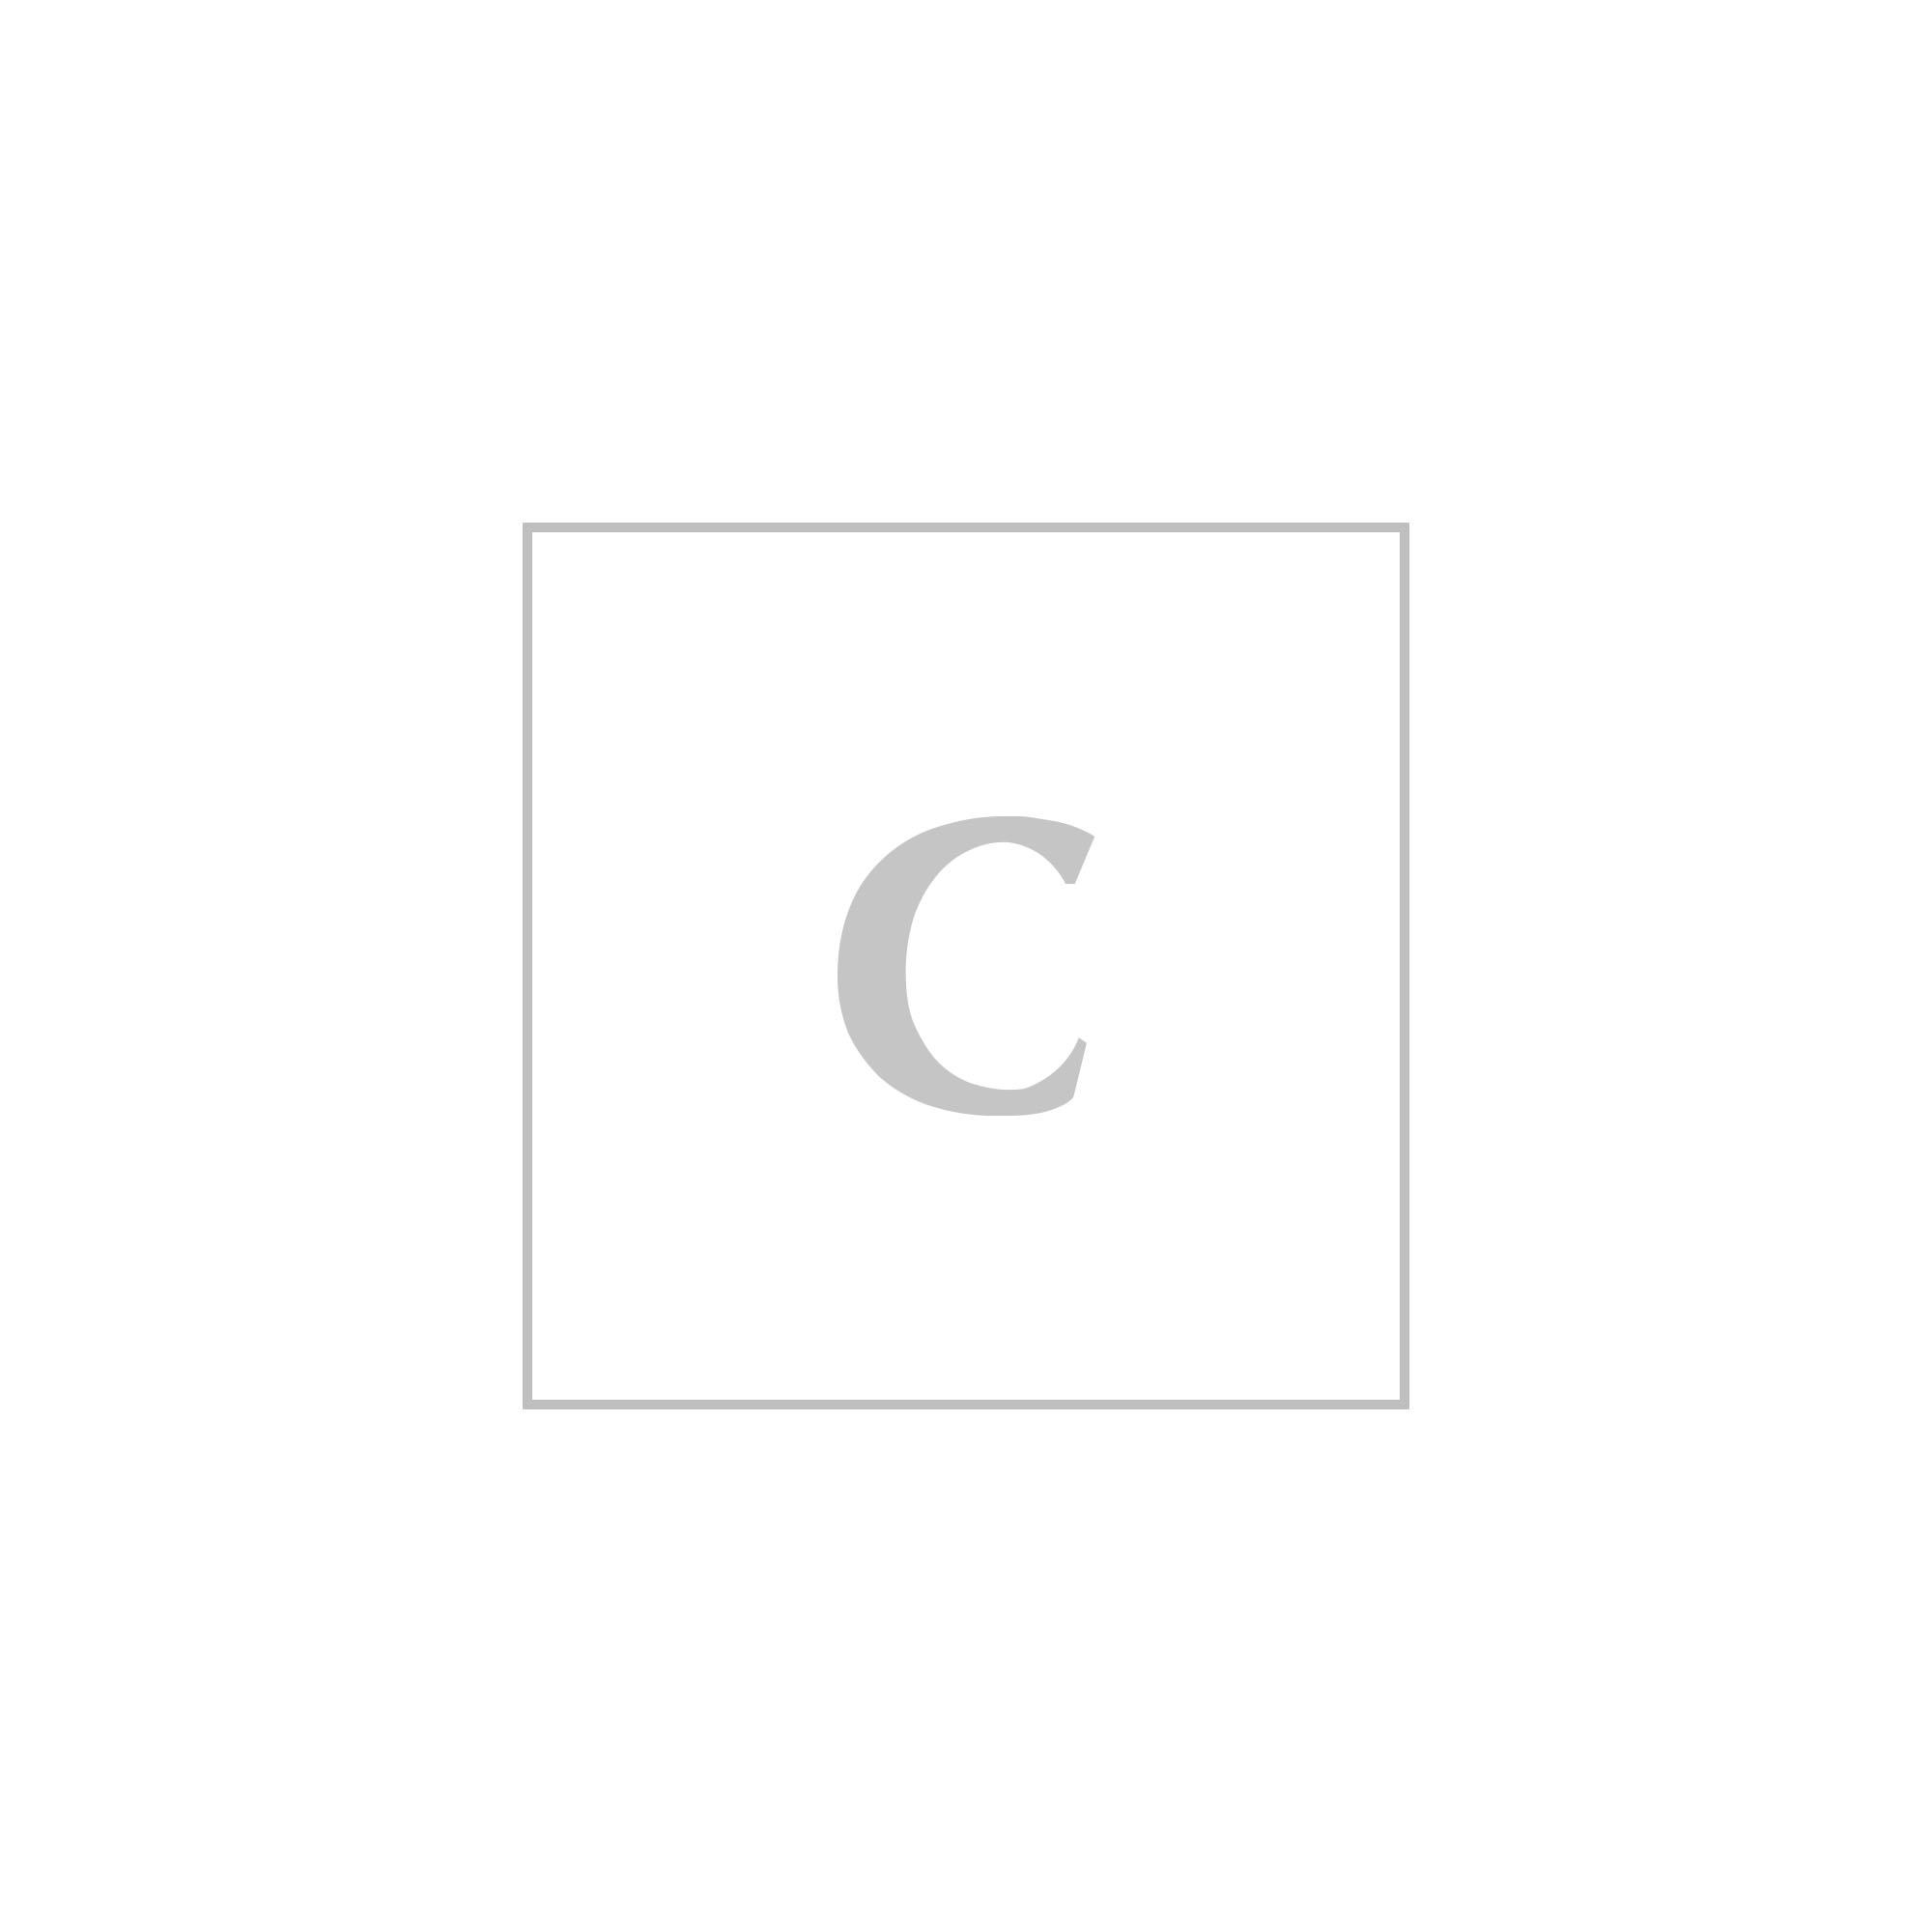 prada abbigliamento donna giacca grisaglia piume struzzo